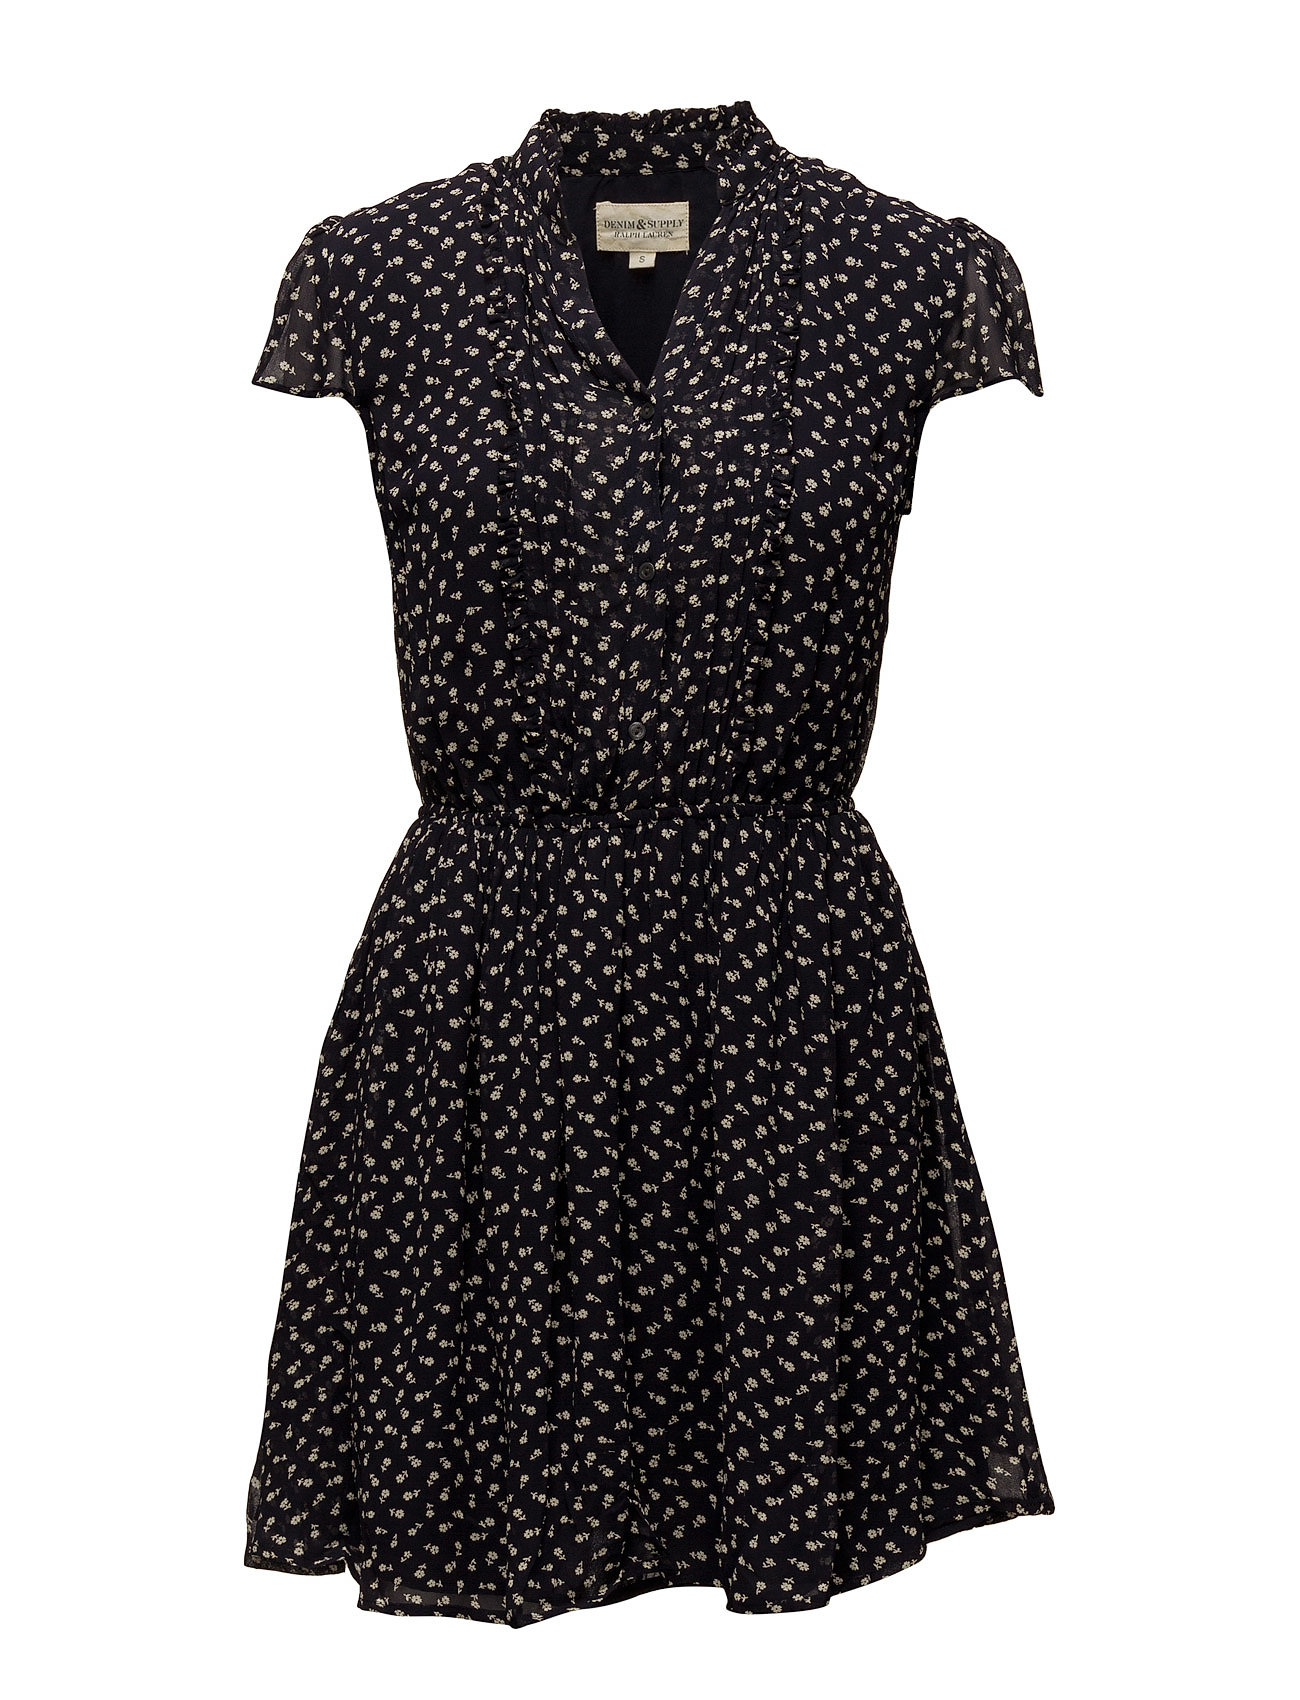 Denim & Supply Ralph Lauren Floral-Print Gauze Dress